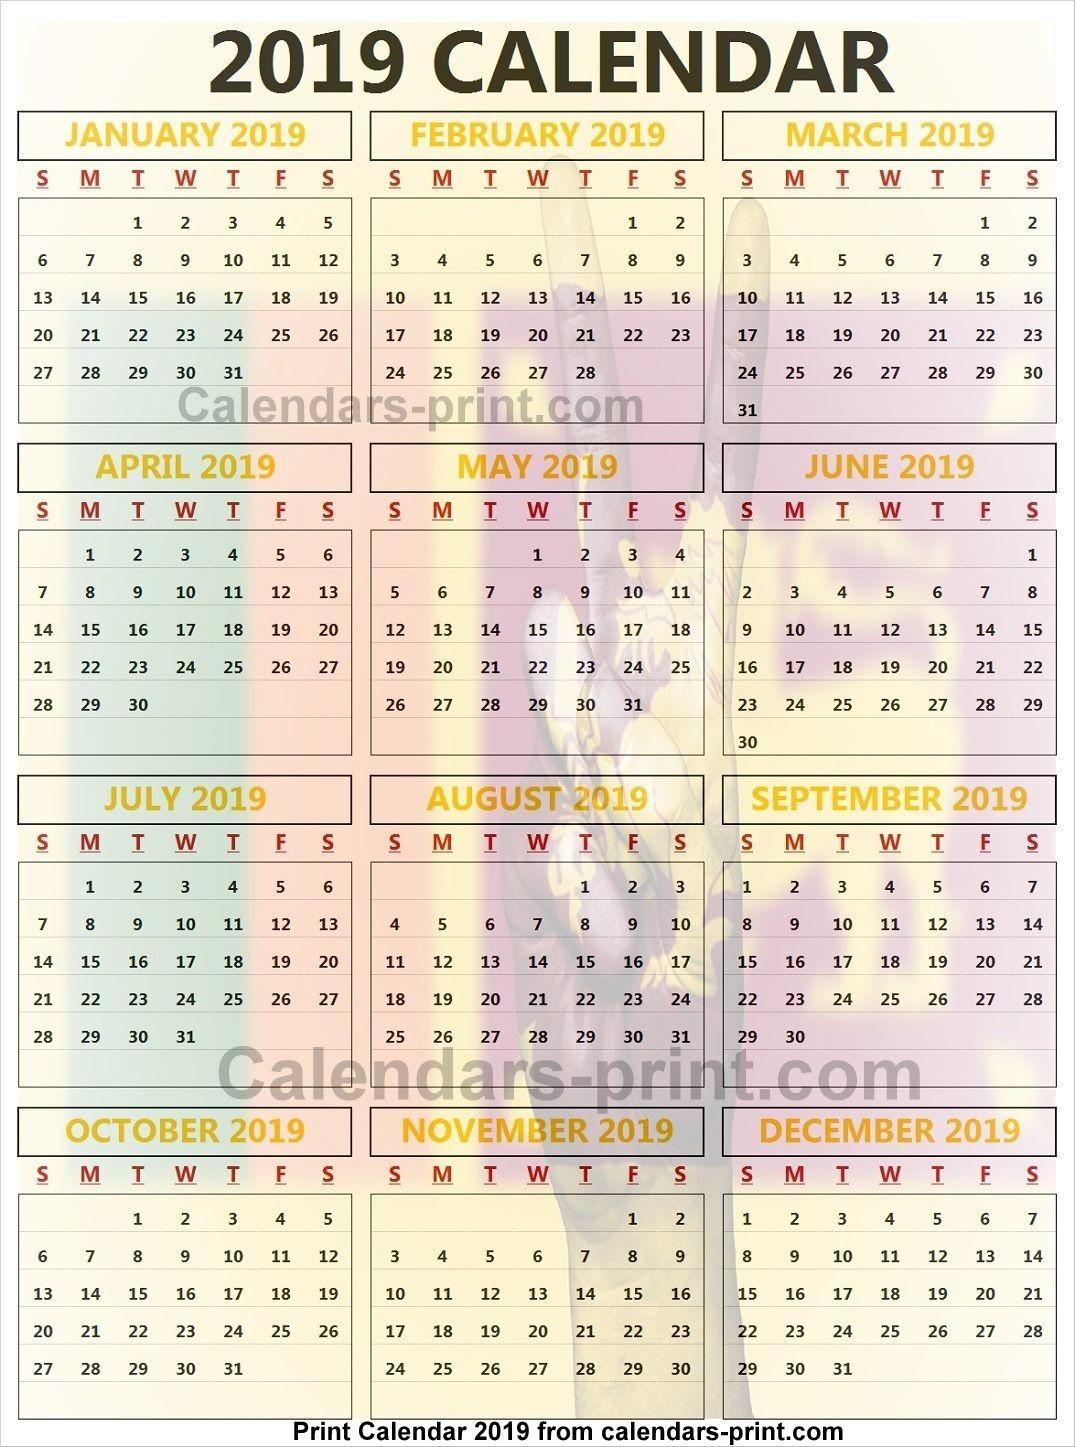 2019-2019 Calendar Printable Sri Lanka Calendar 2019 2019 Yearly Calendar